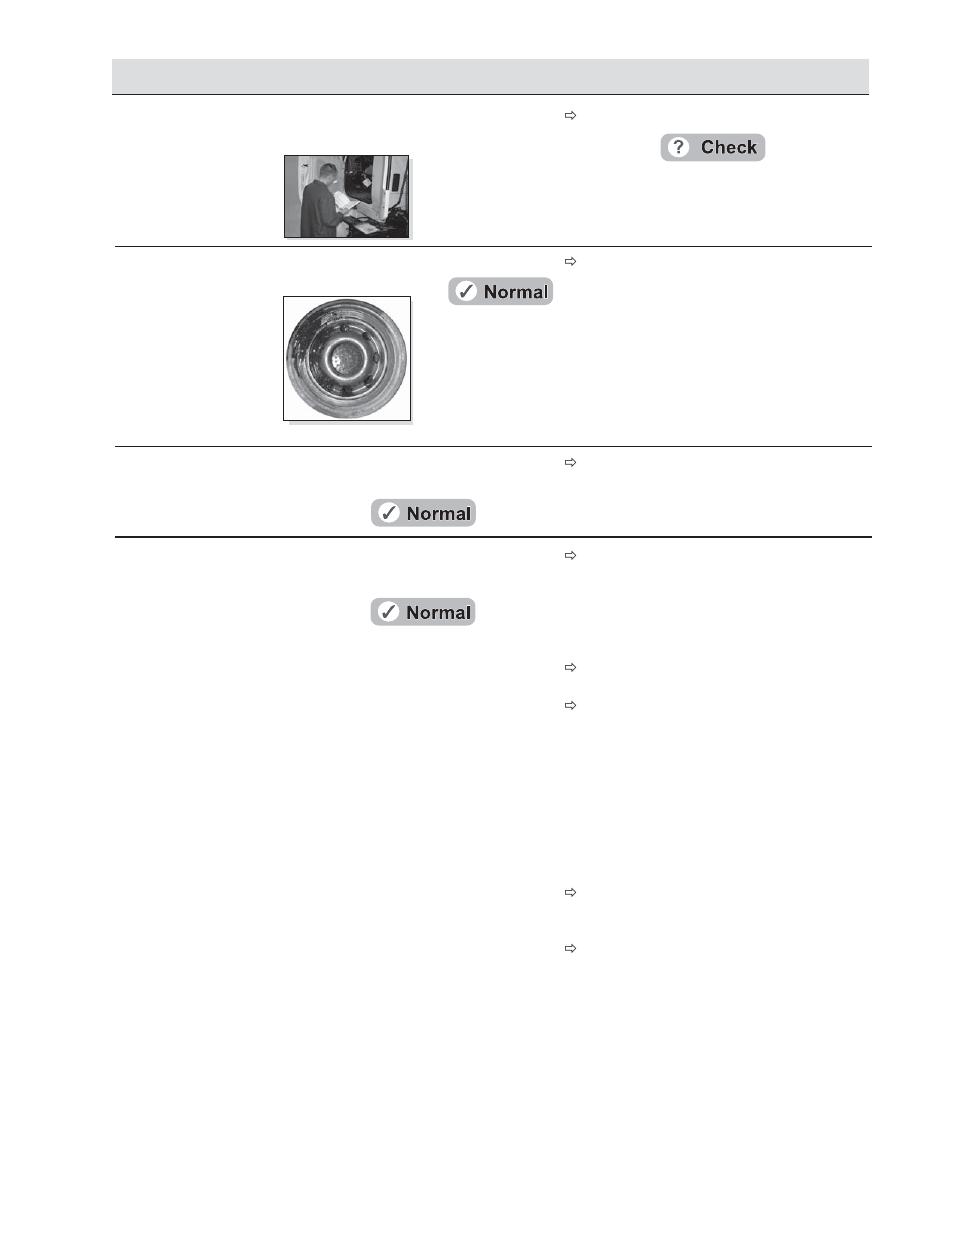 Bendix Commercial Vehicle Systems TU-FLO 550 COMPRESSOR 6/08 User